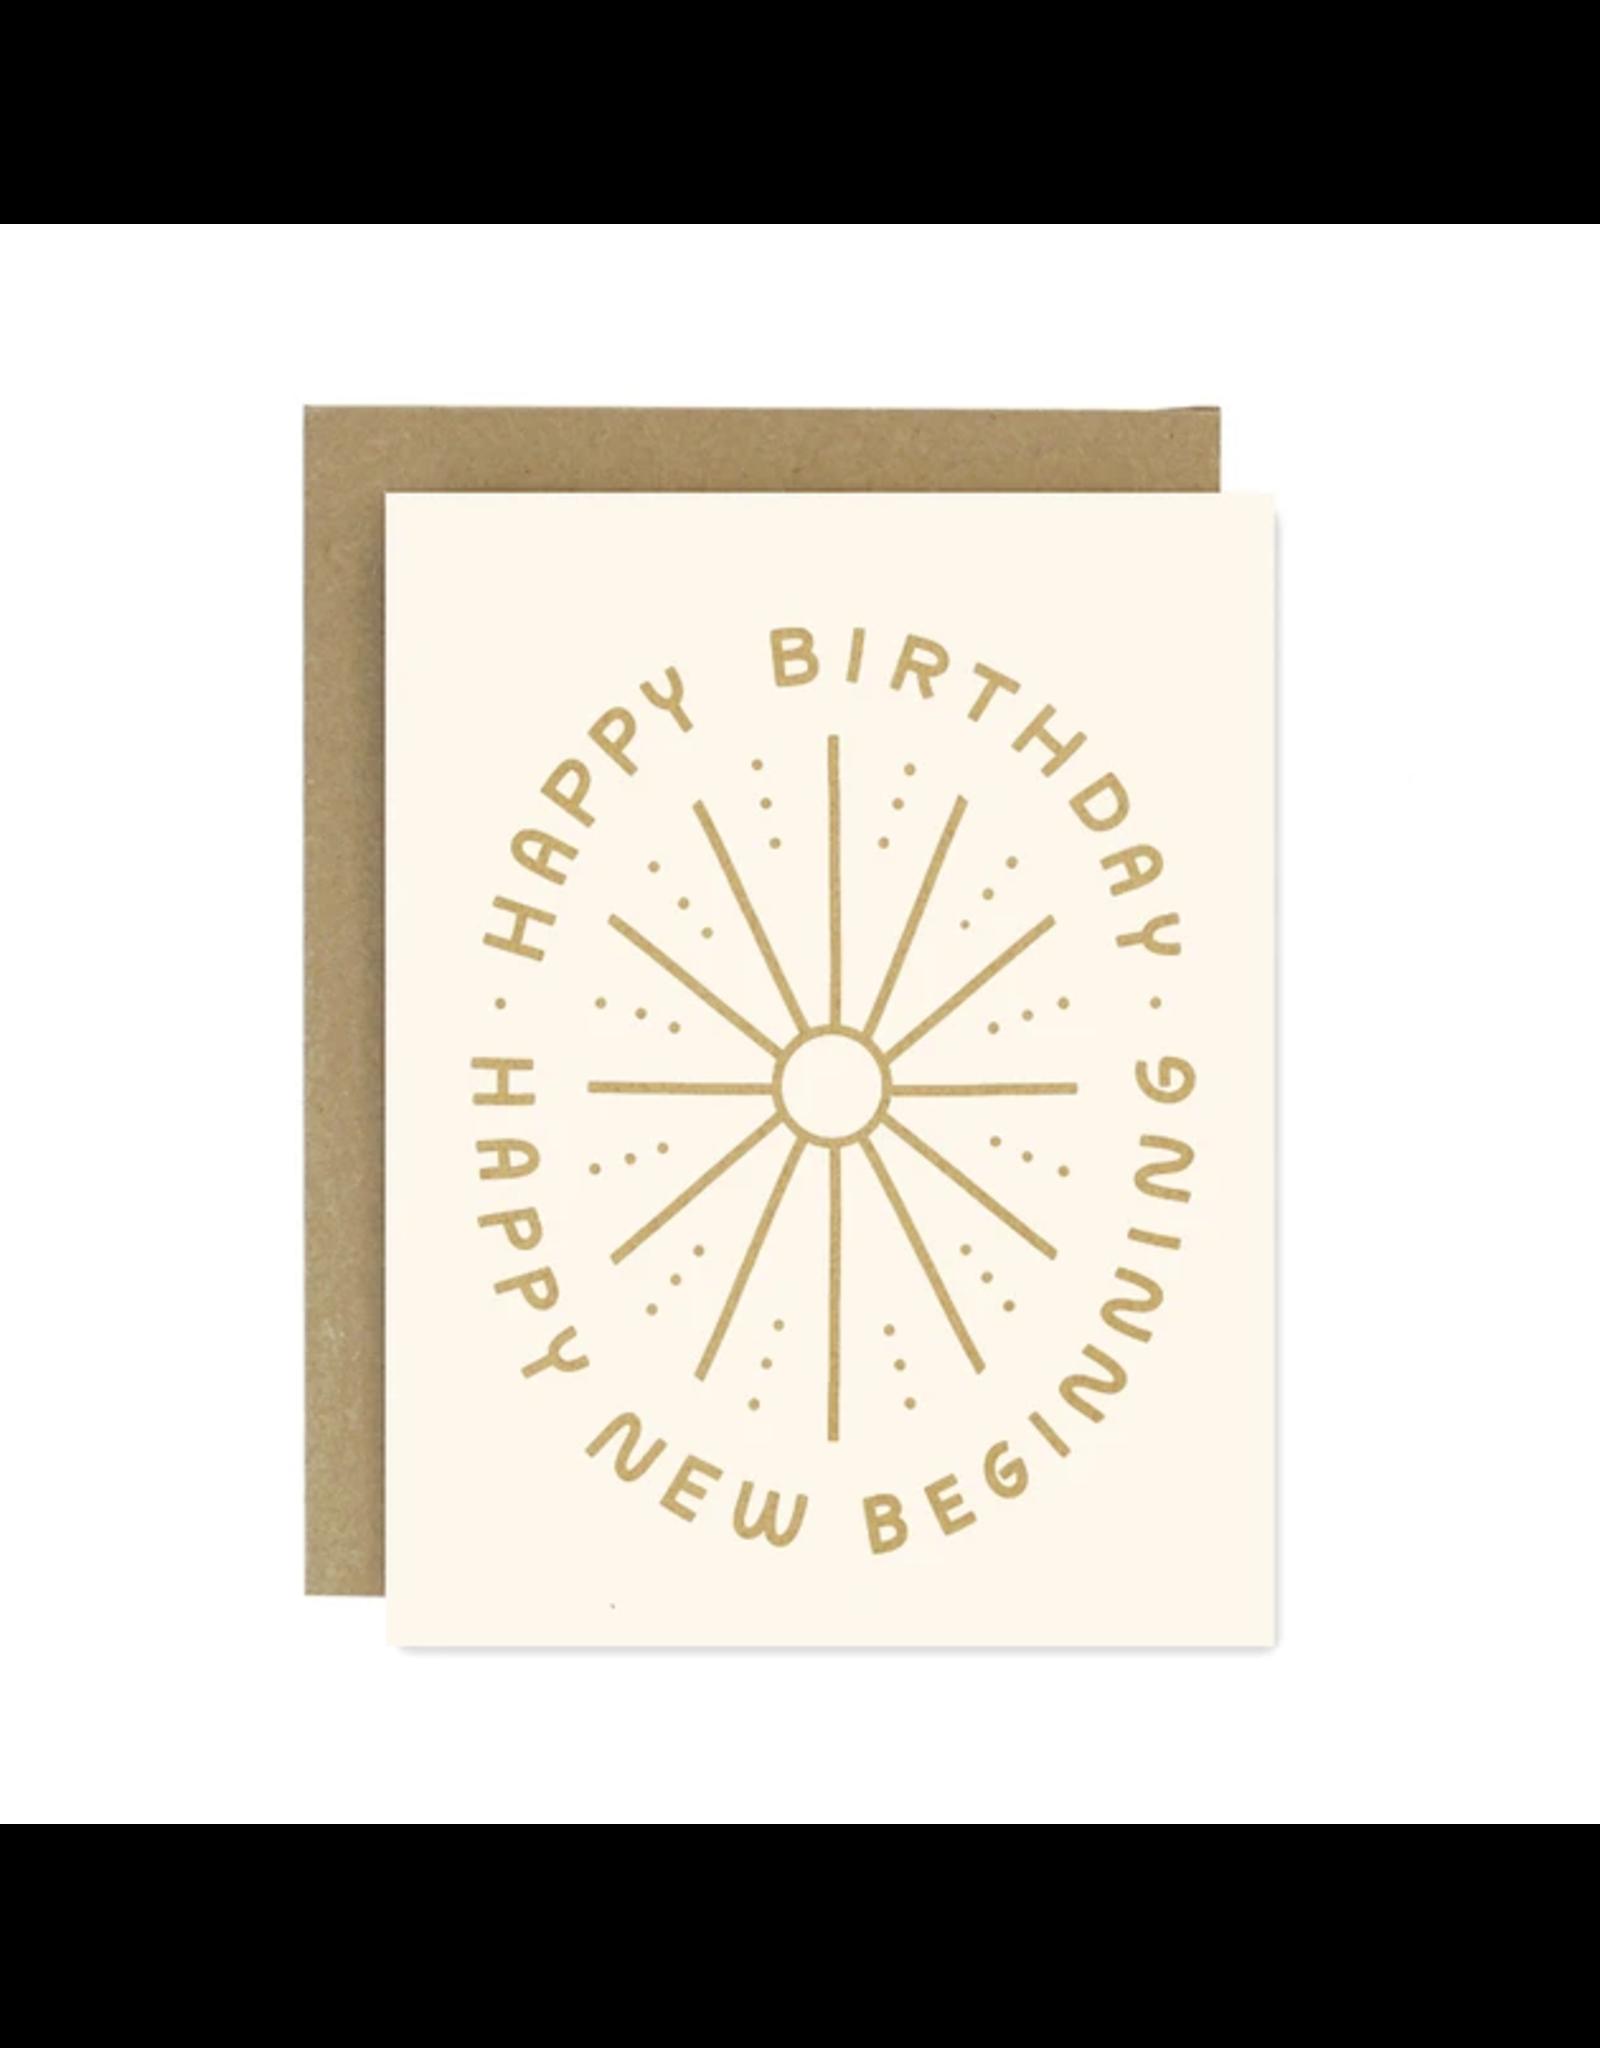 Worthwhile Paper Birthday New Beginnings Card